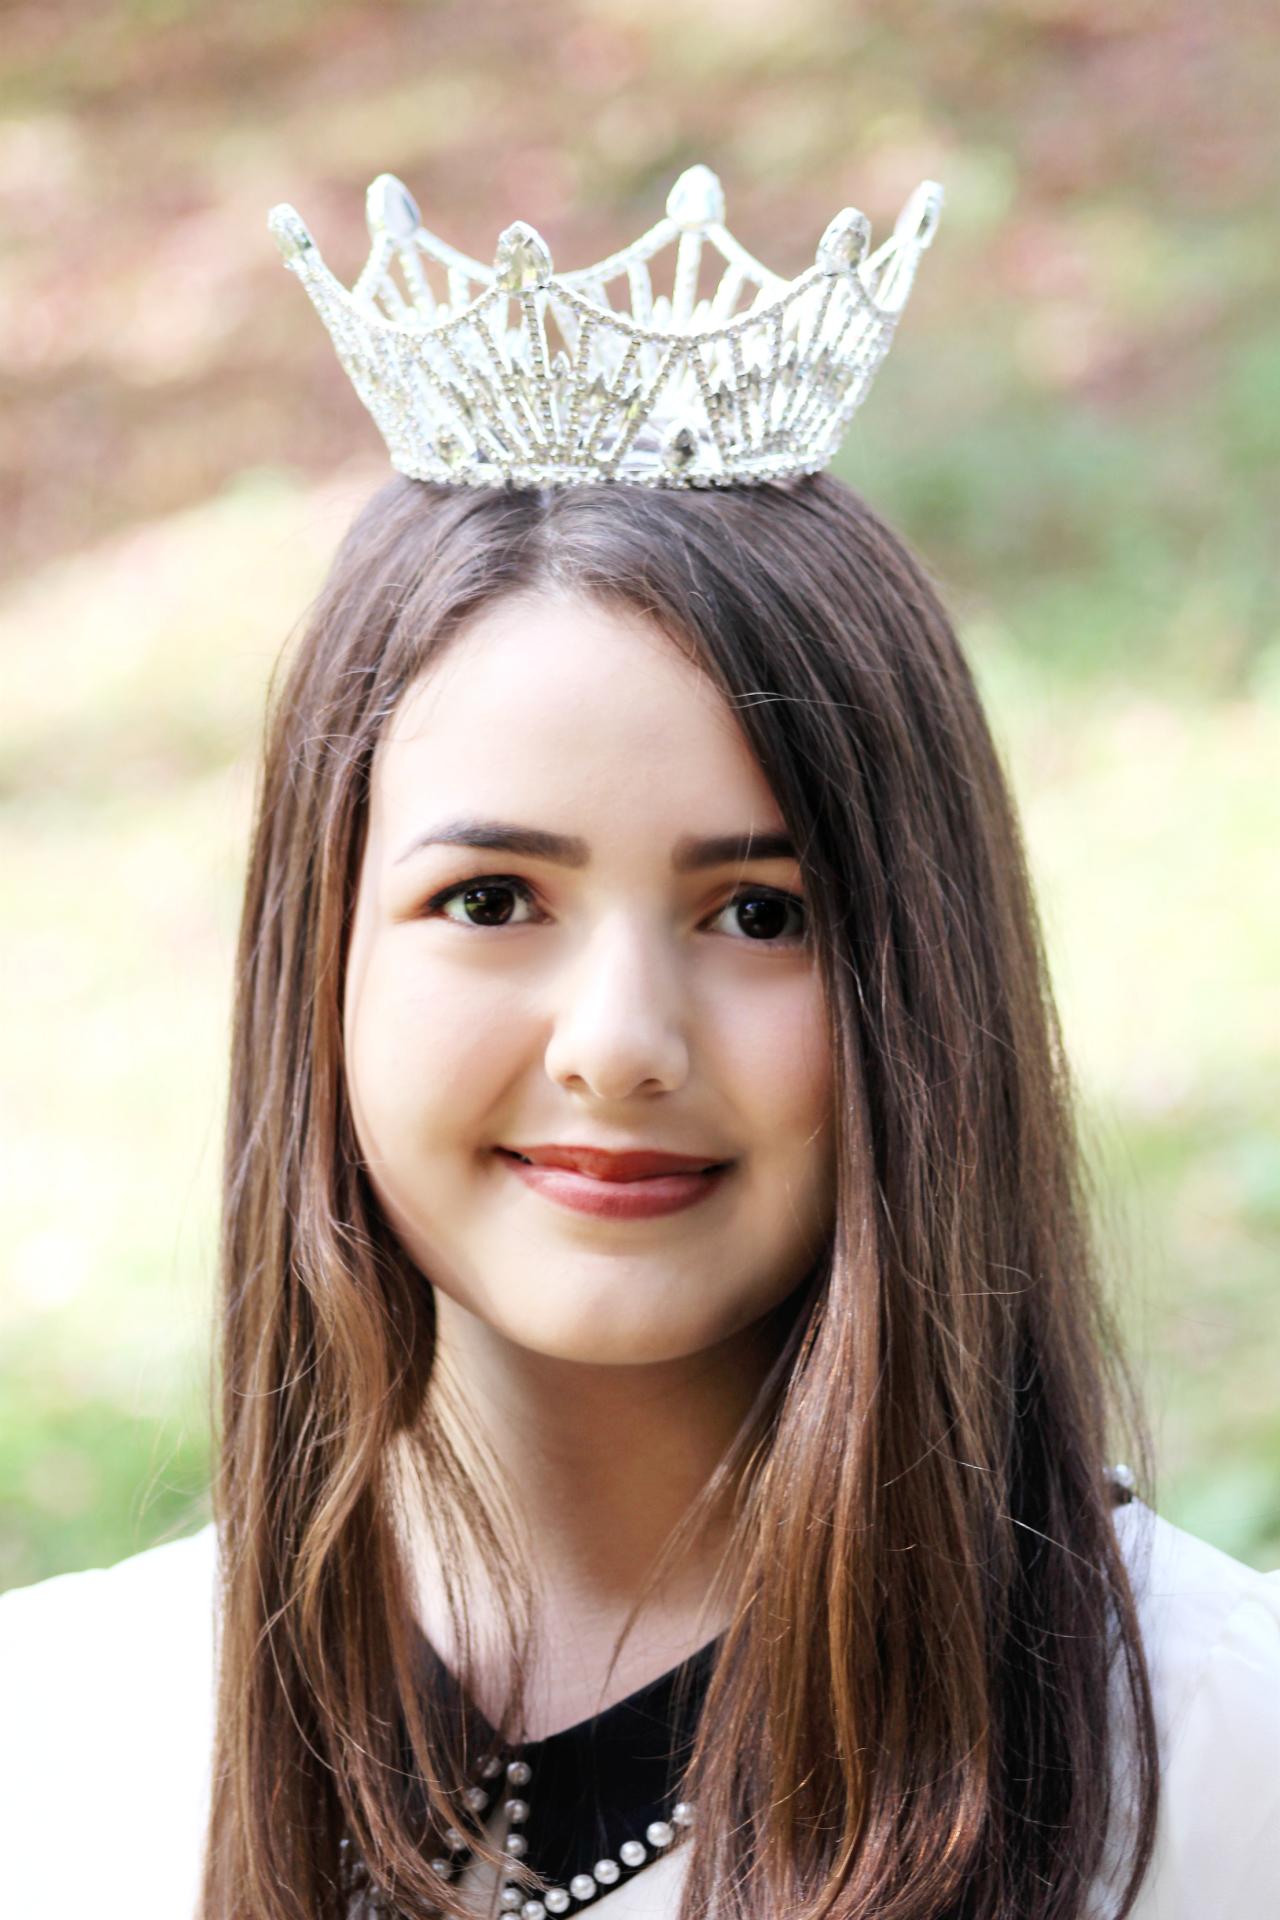 Miss New York Junior High School America